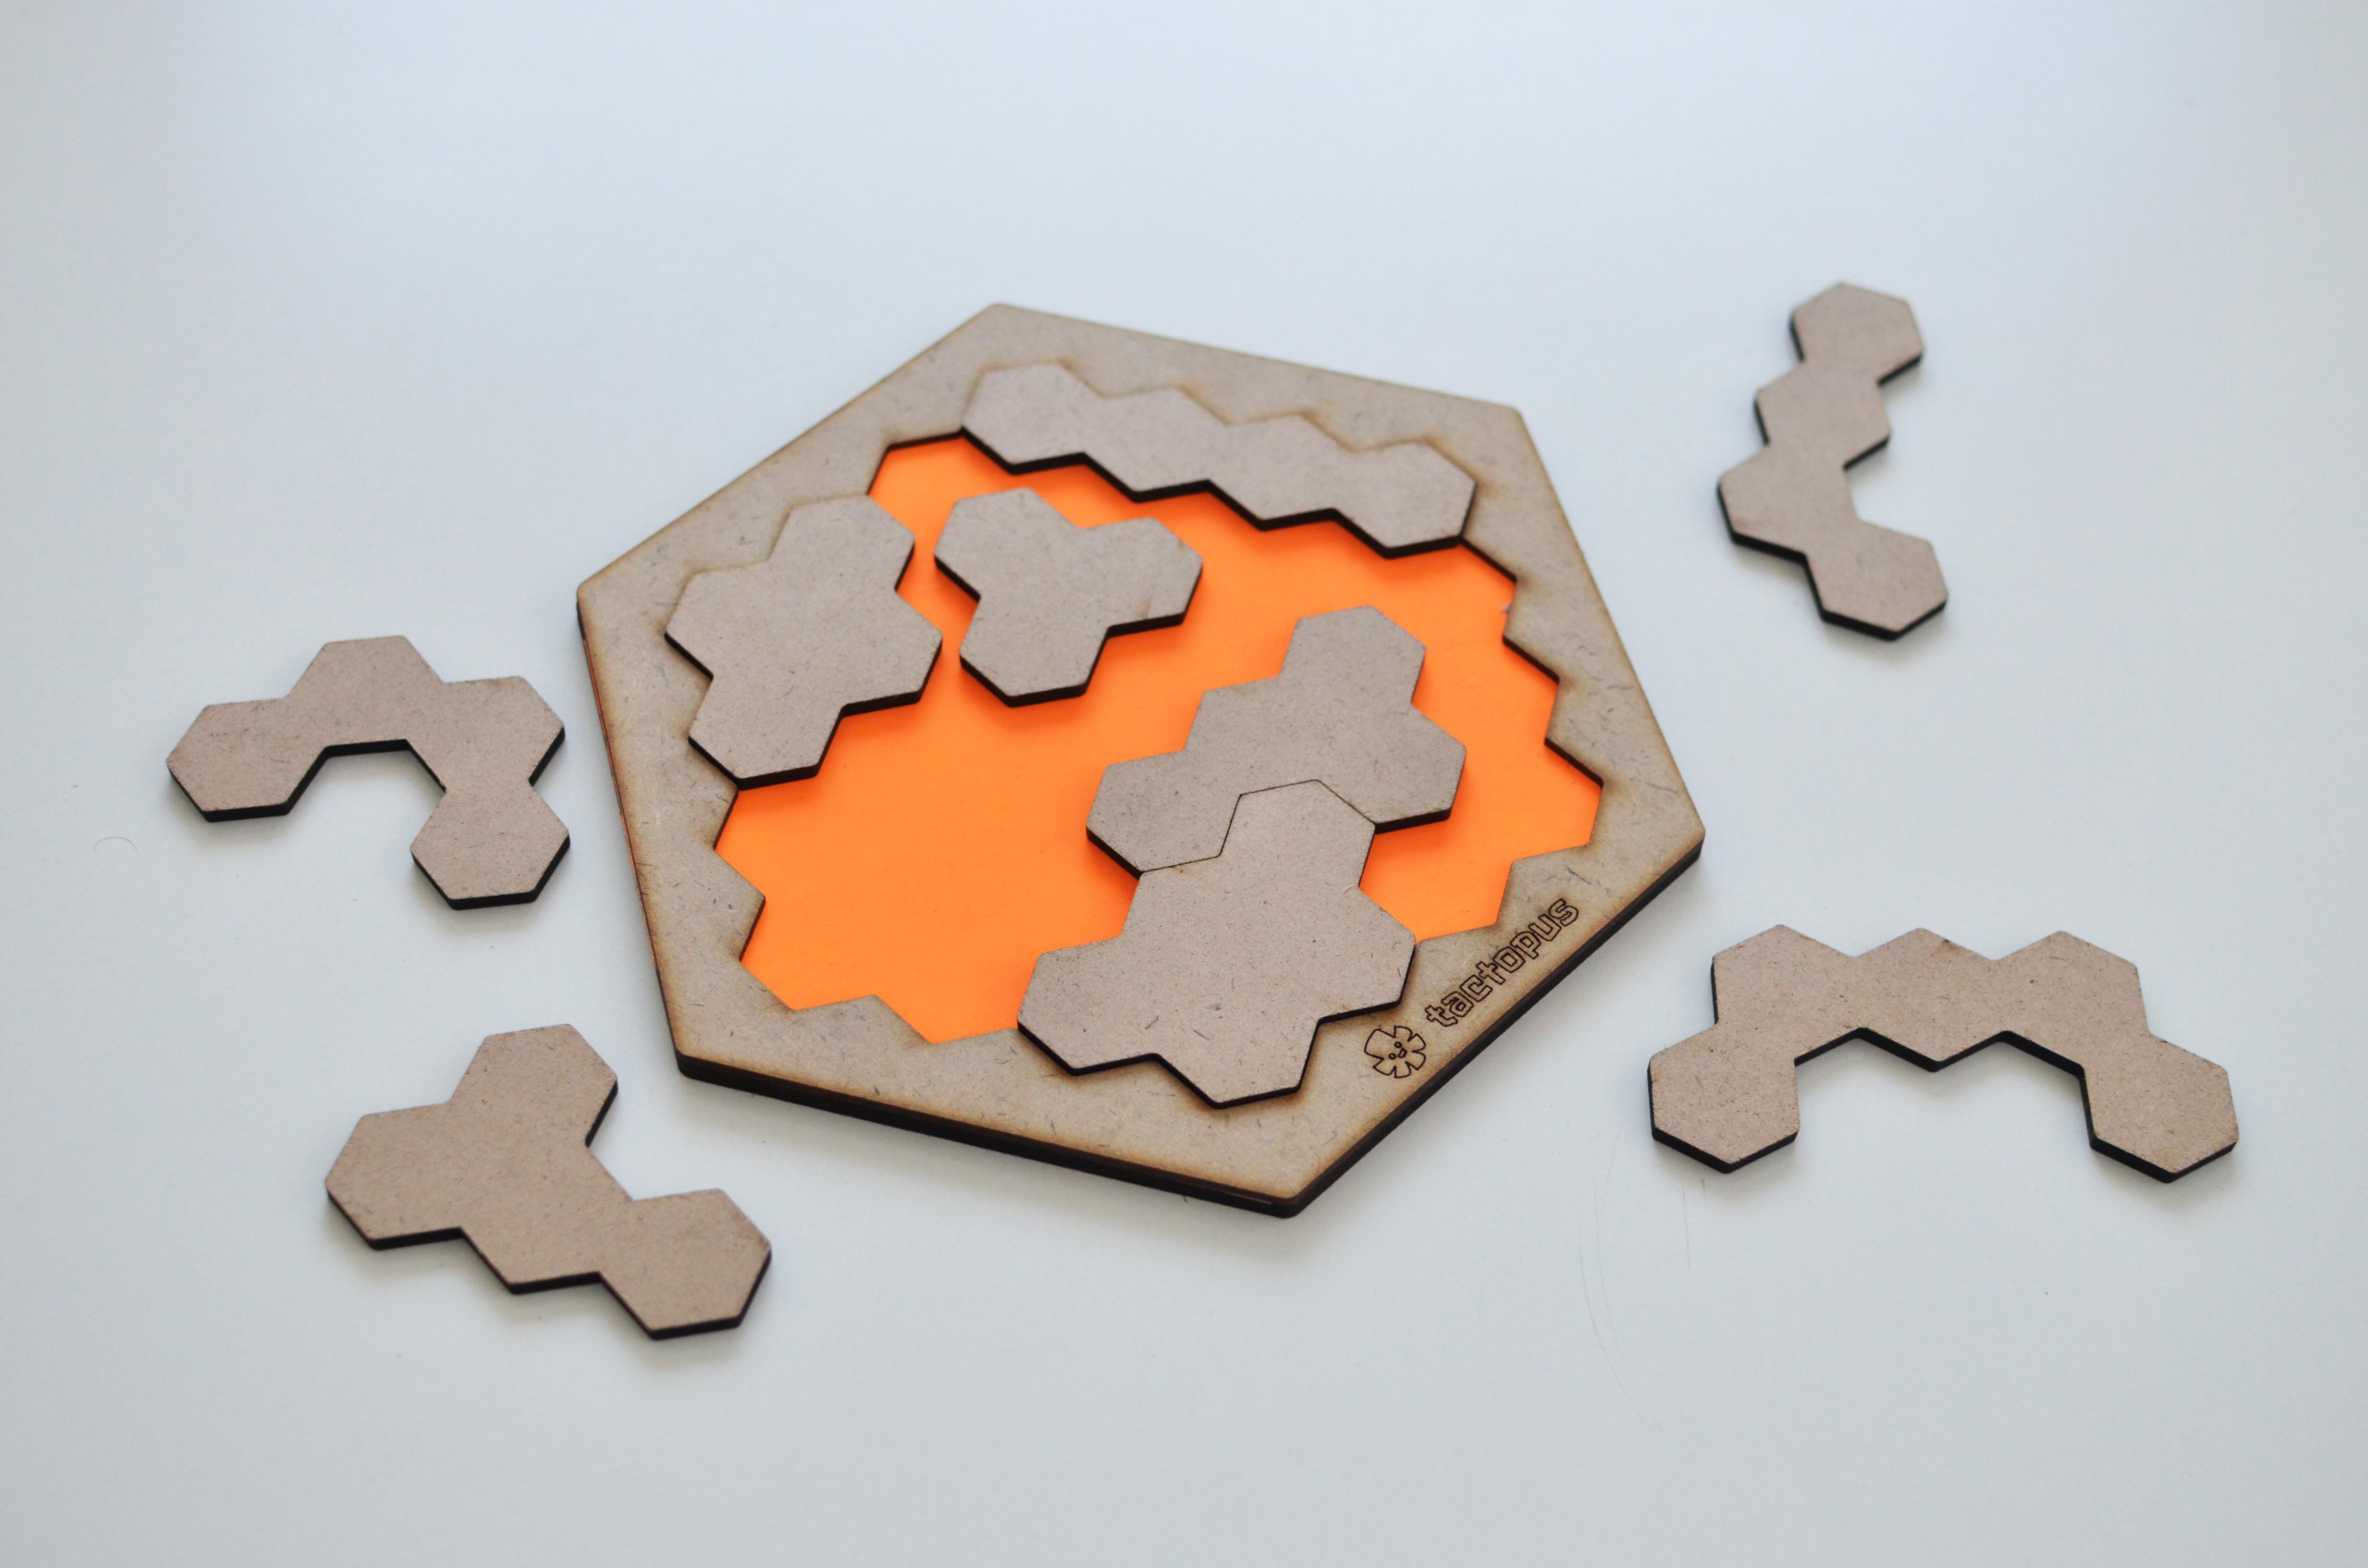 Hexagonal Tetris Puzzle Board